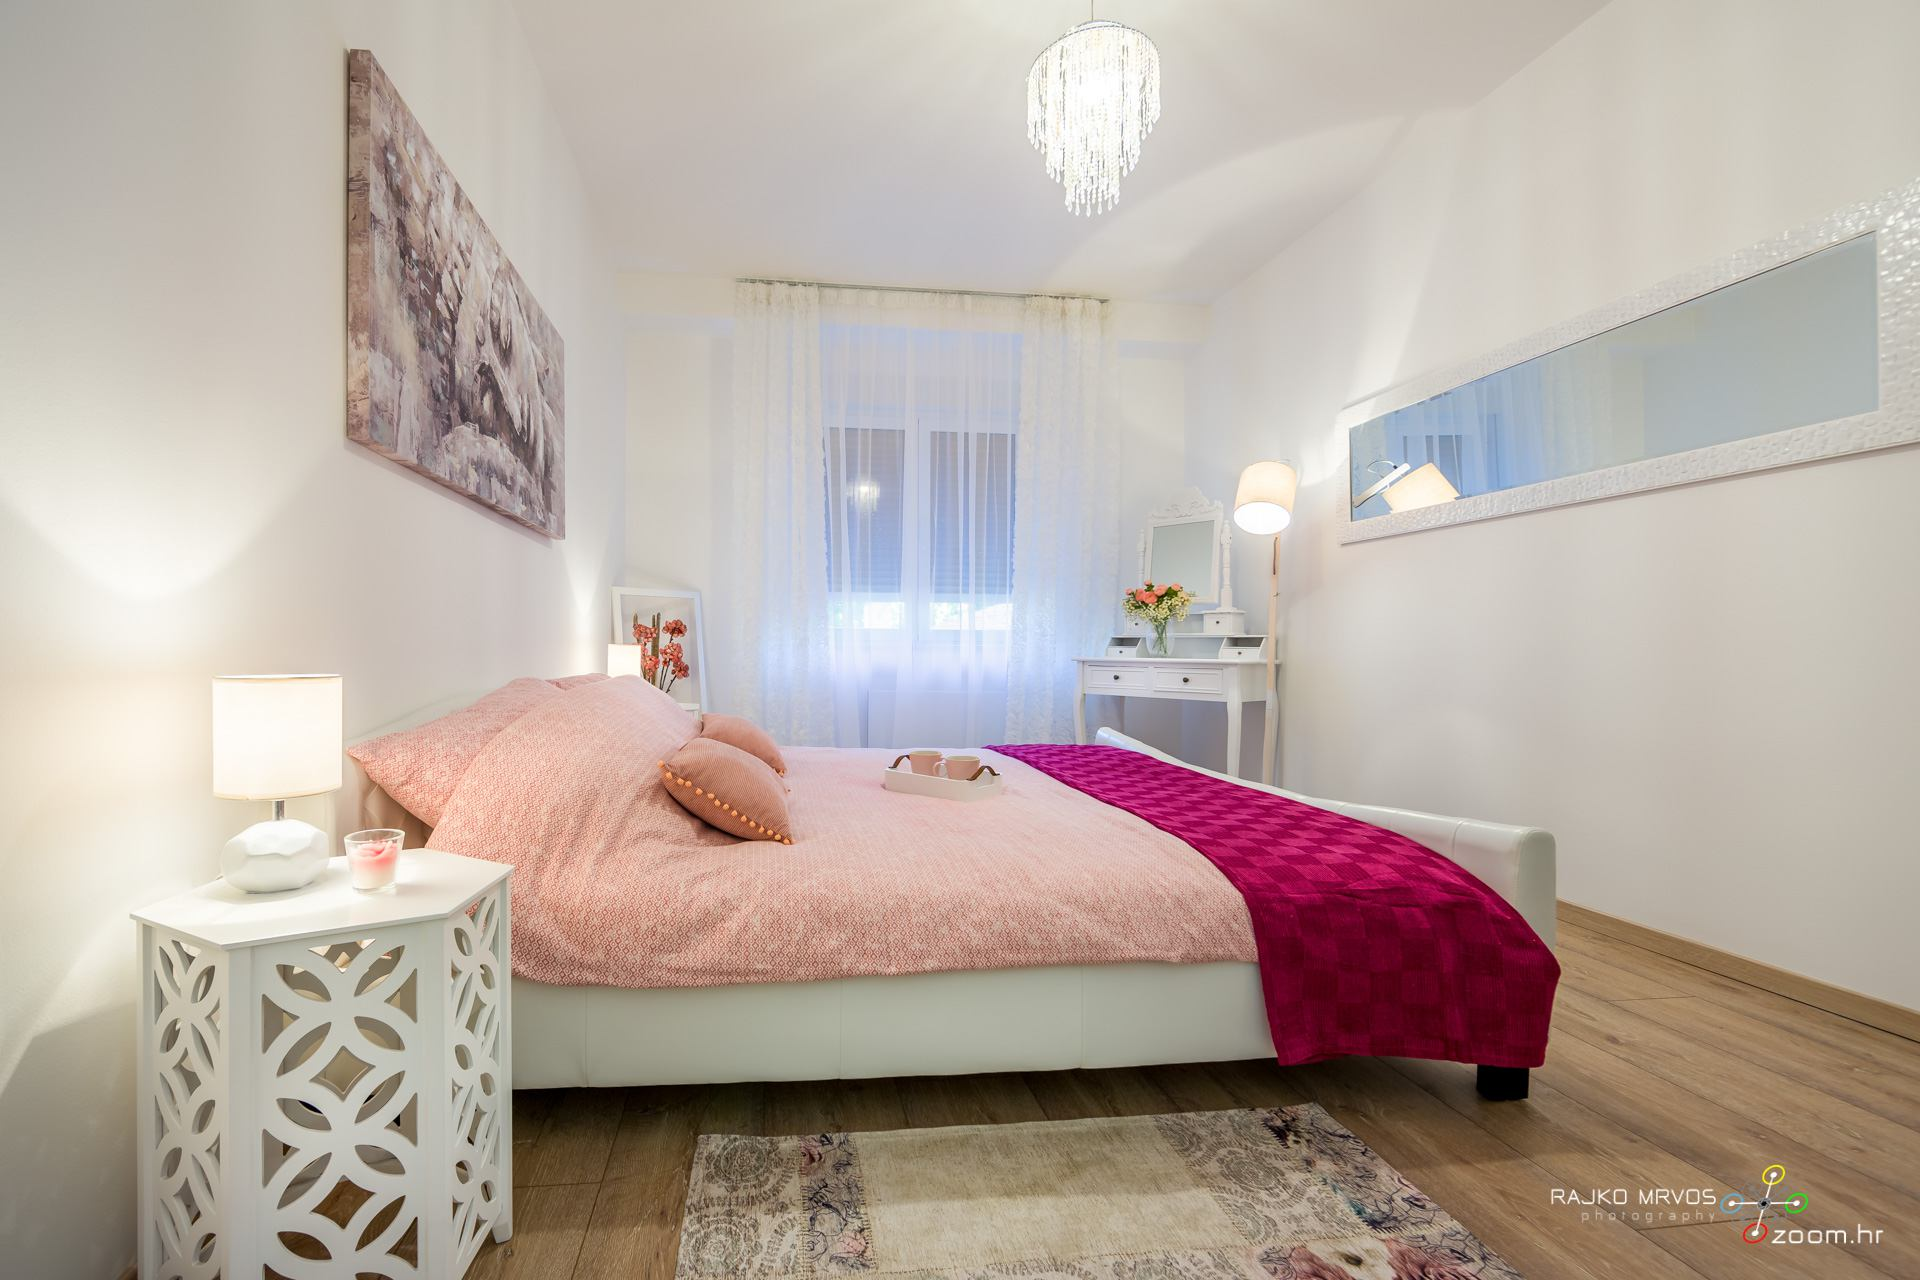 fotografiranje-interijera-fotograf-apartmana-vila-kuca-hotela-apartman-Gabby-Rijeka-5